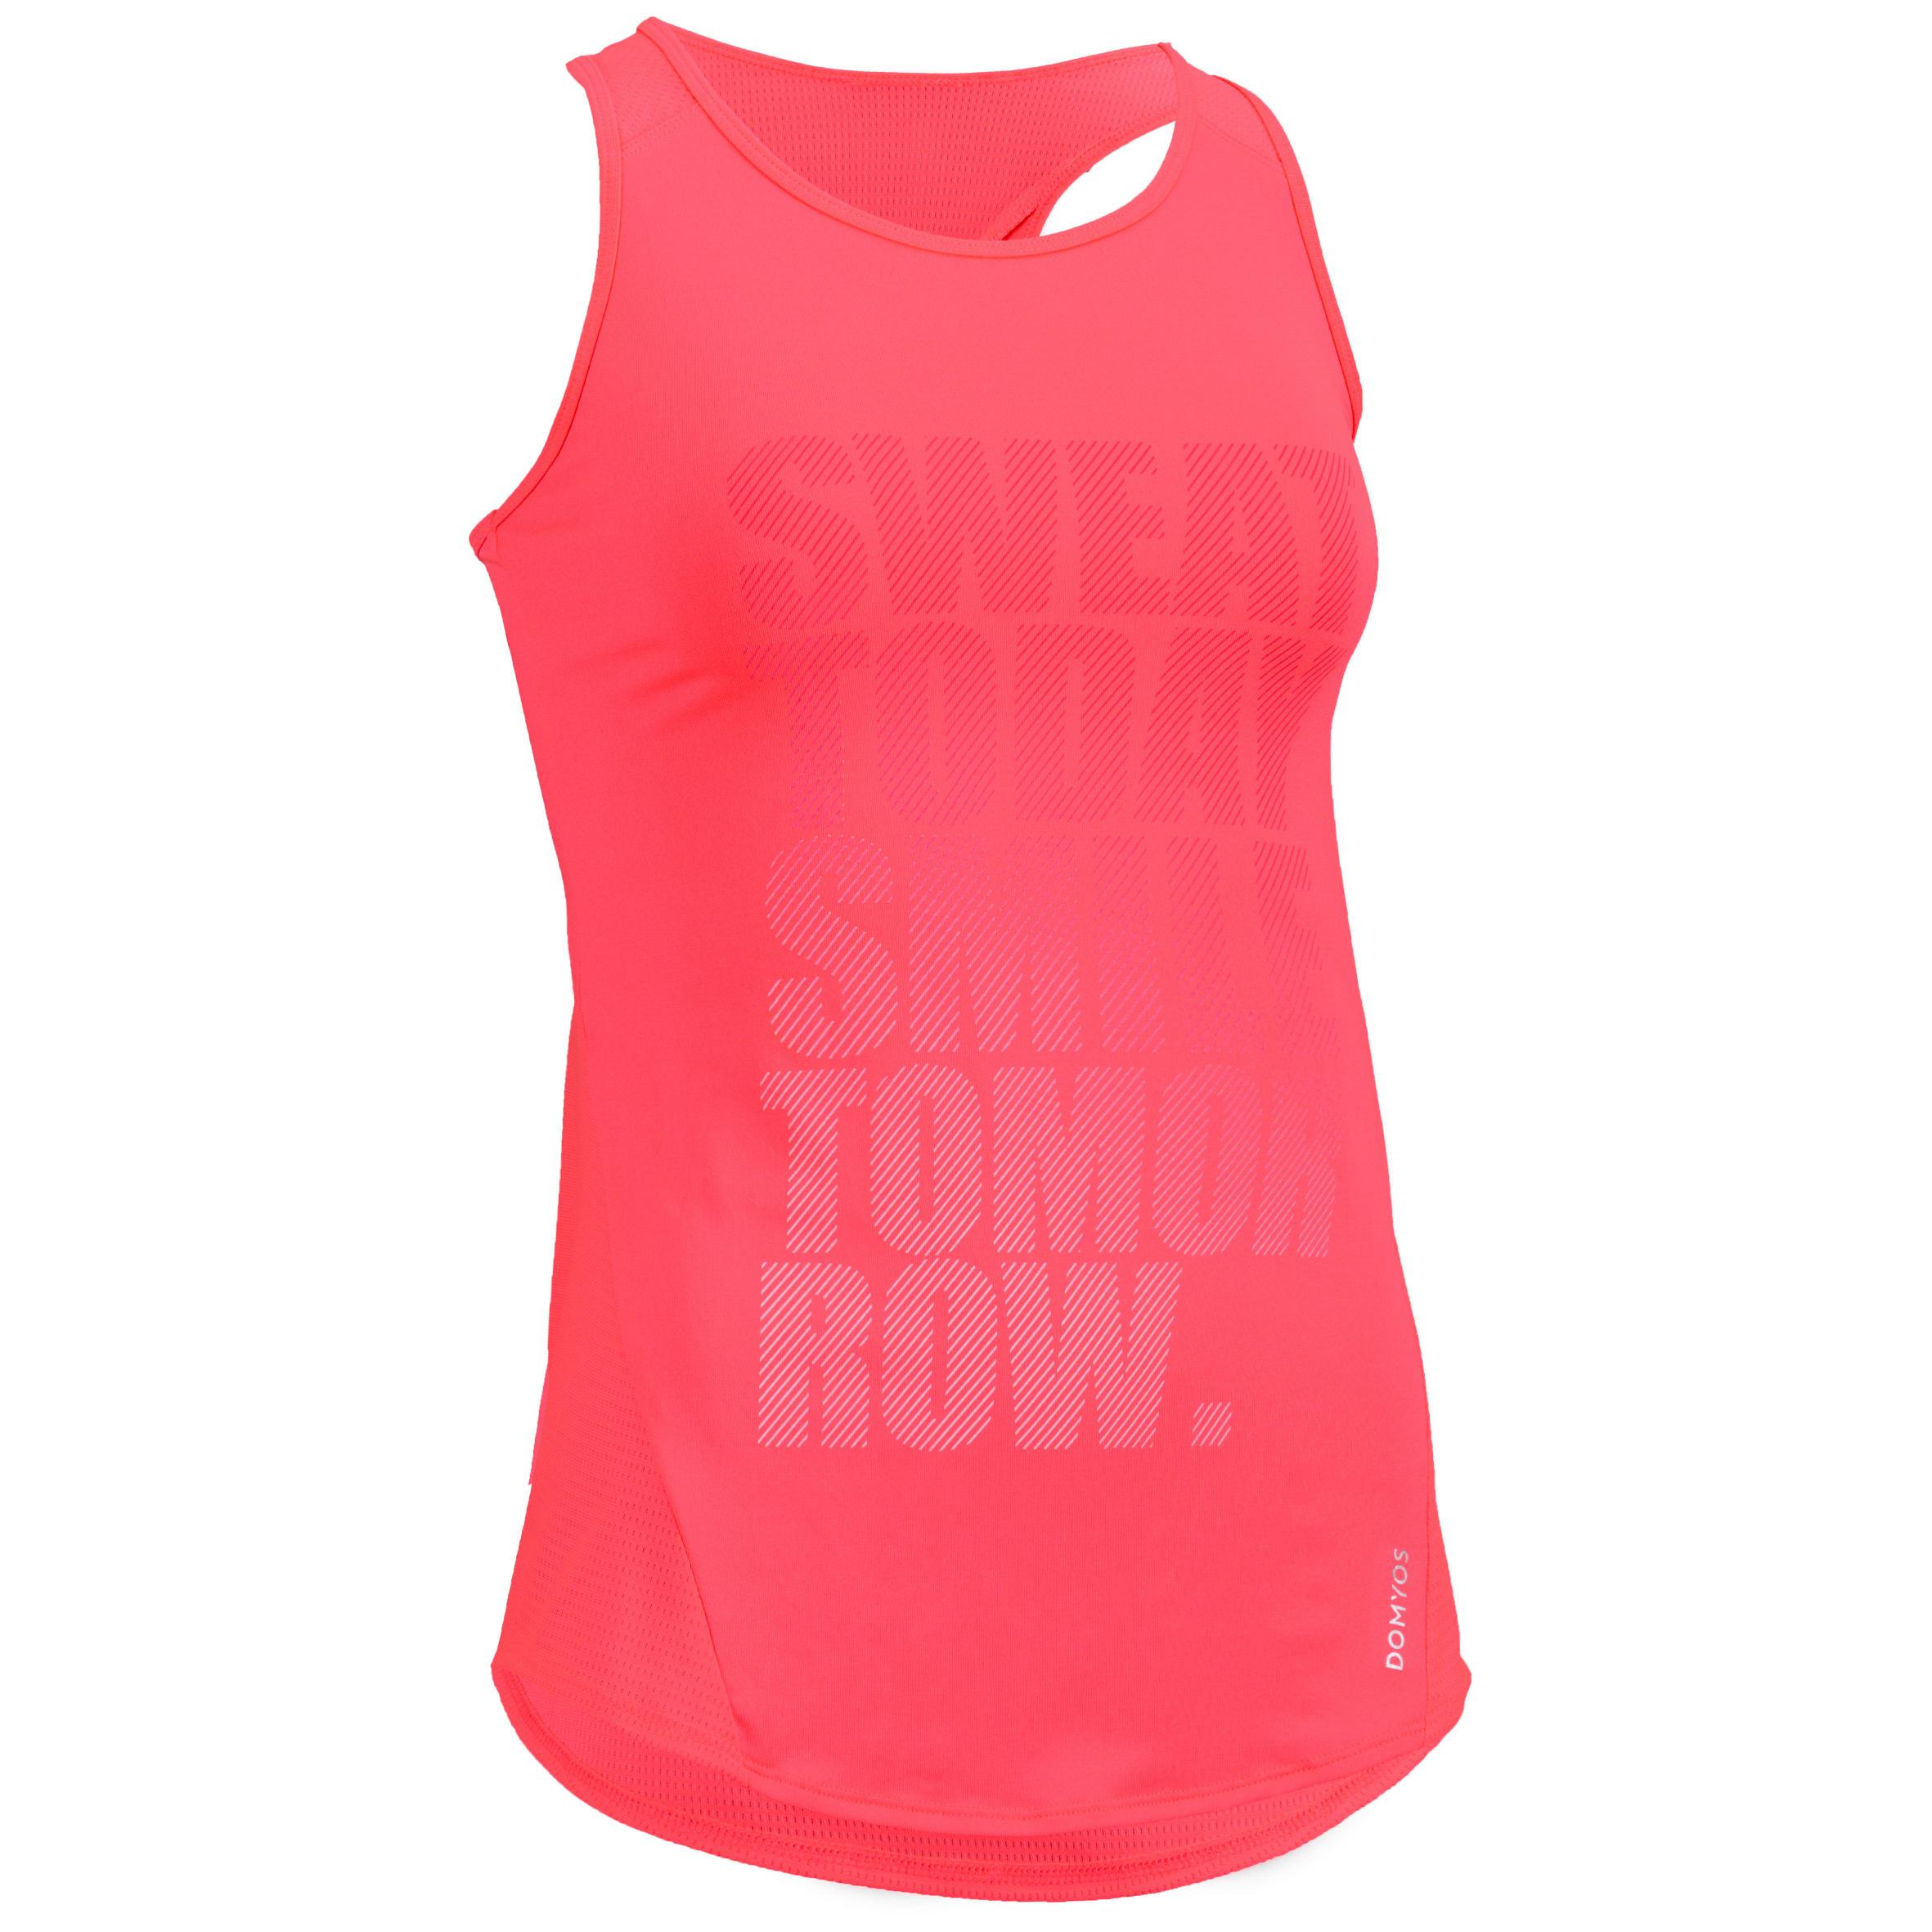 Camiseta sin mangas cardio fitness mujer rosa estampado 120